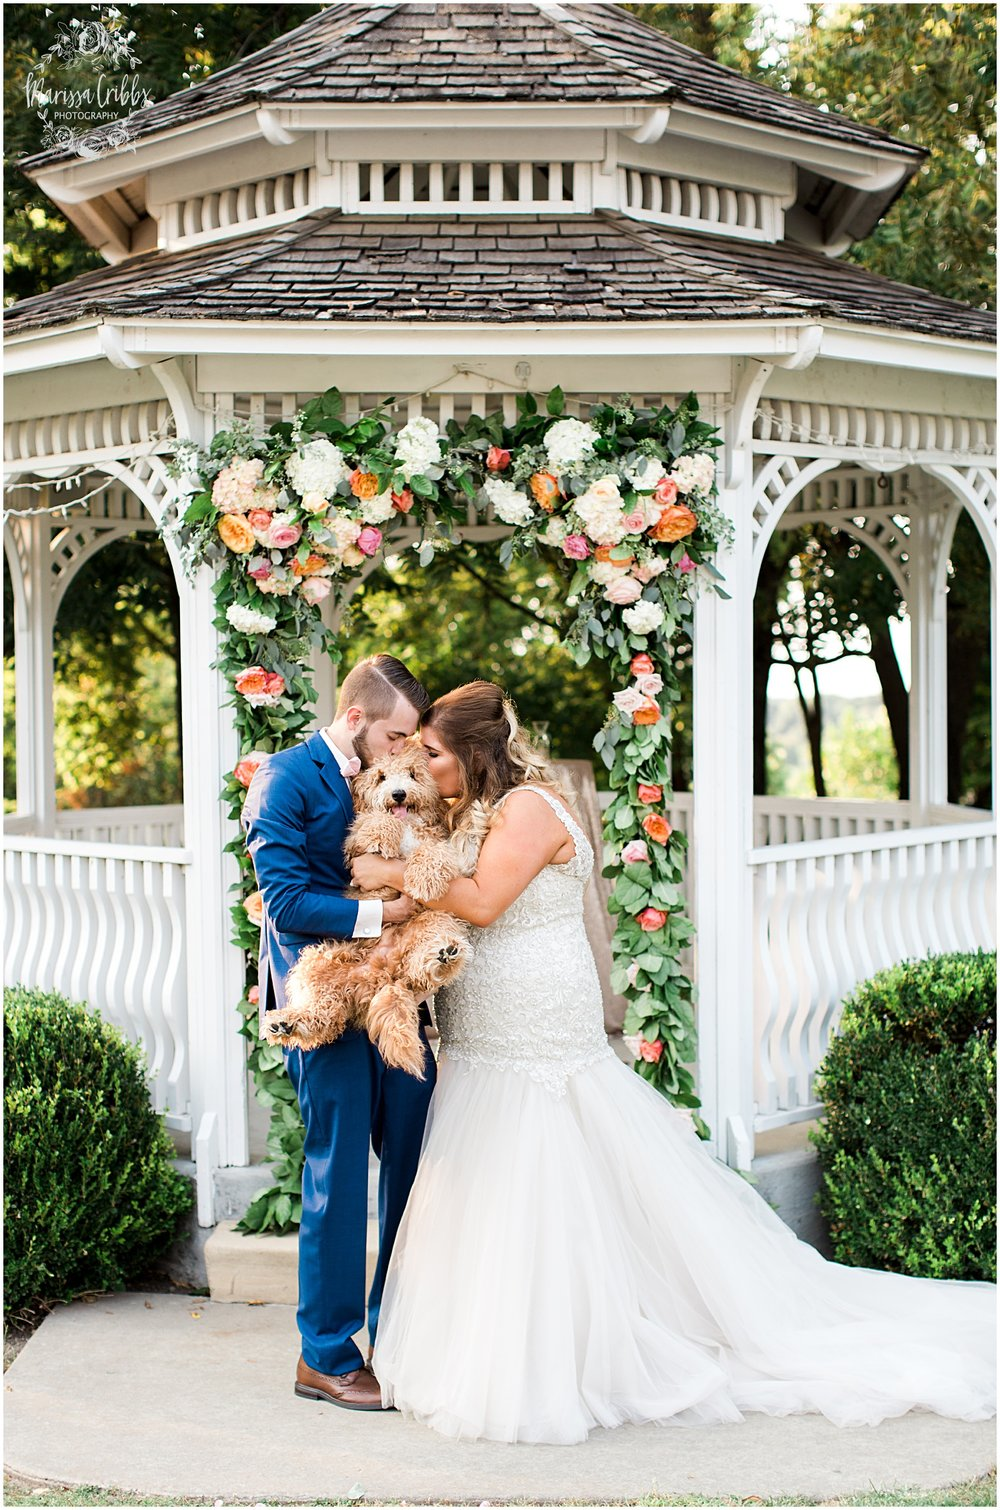 2017 wedding recap | MARISSA CRIBBS PHOTOGRAPHY_4098.jpg